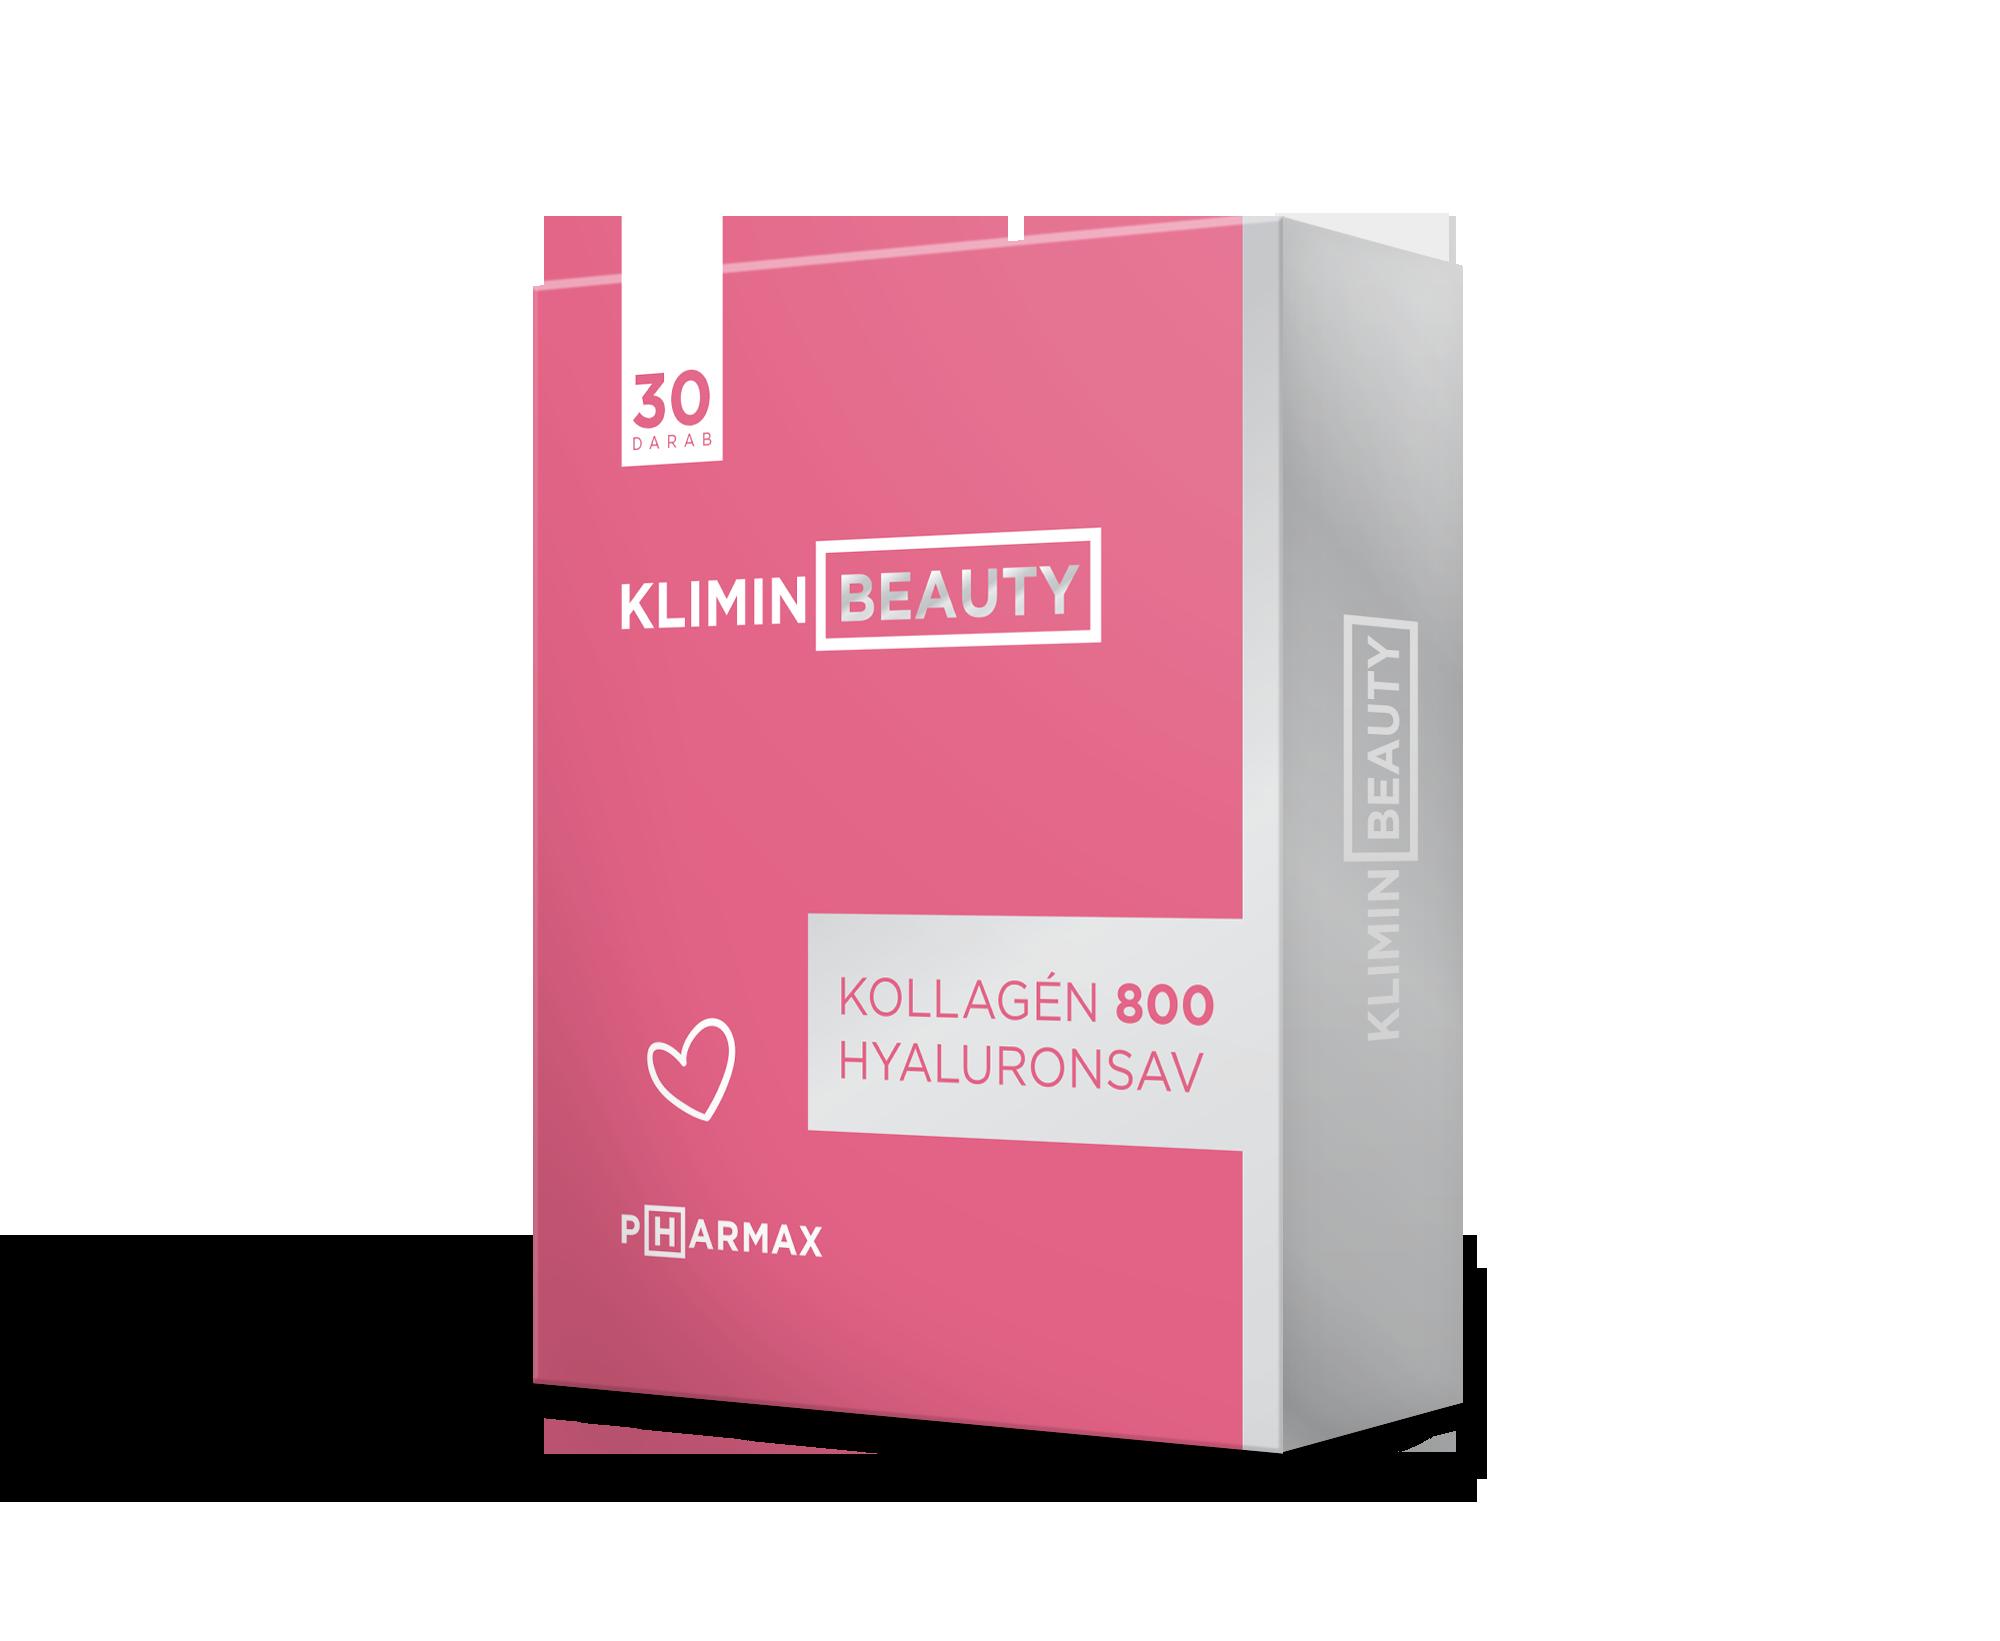 Klimin Beauty - Pharmax